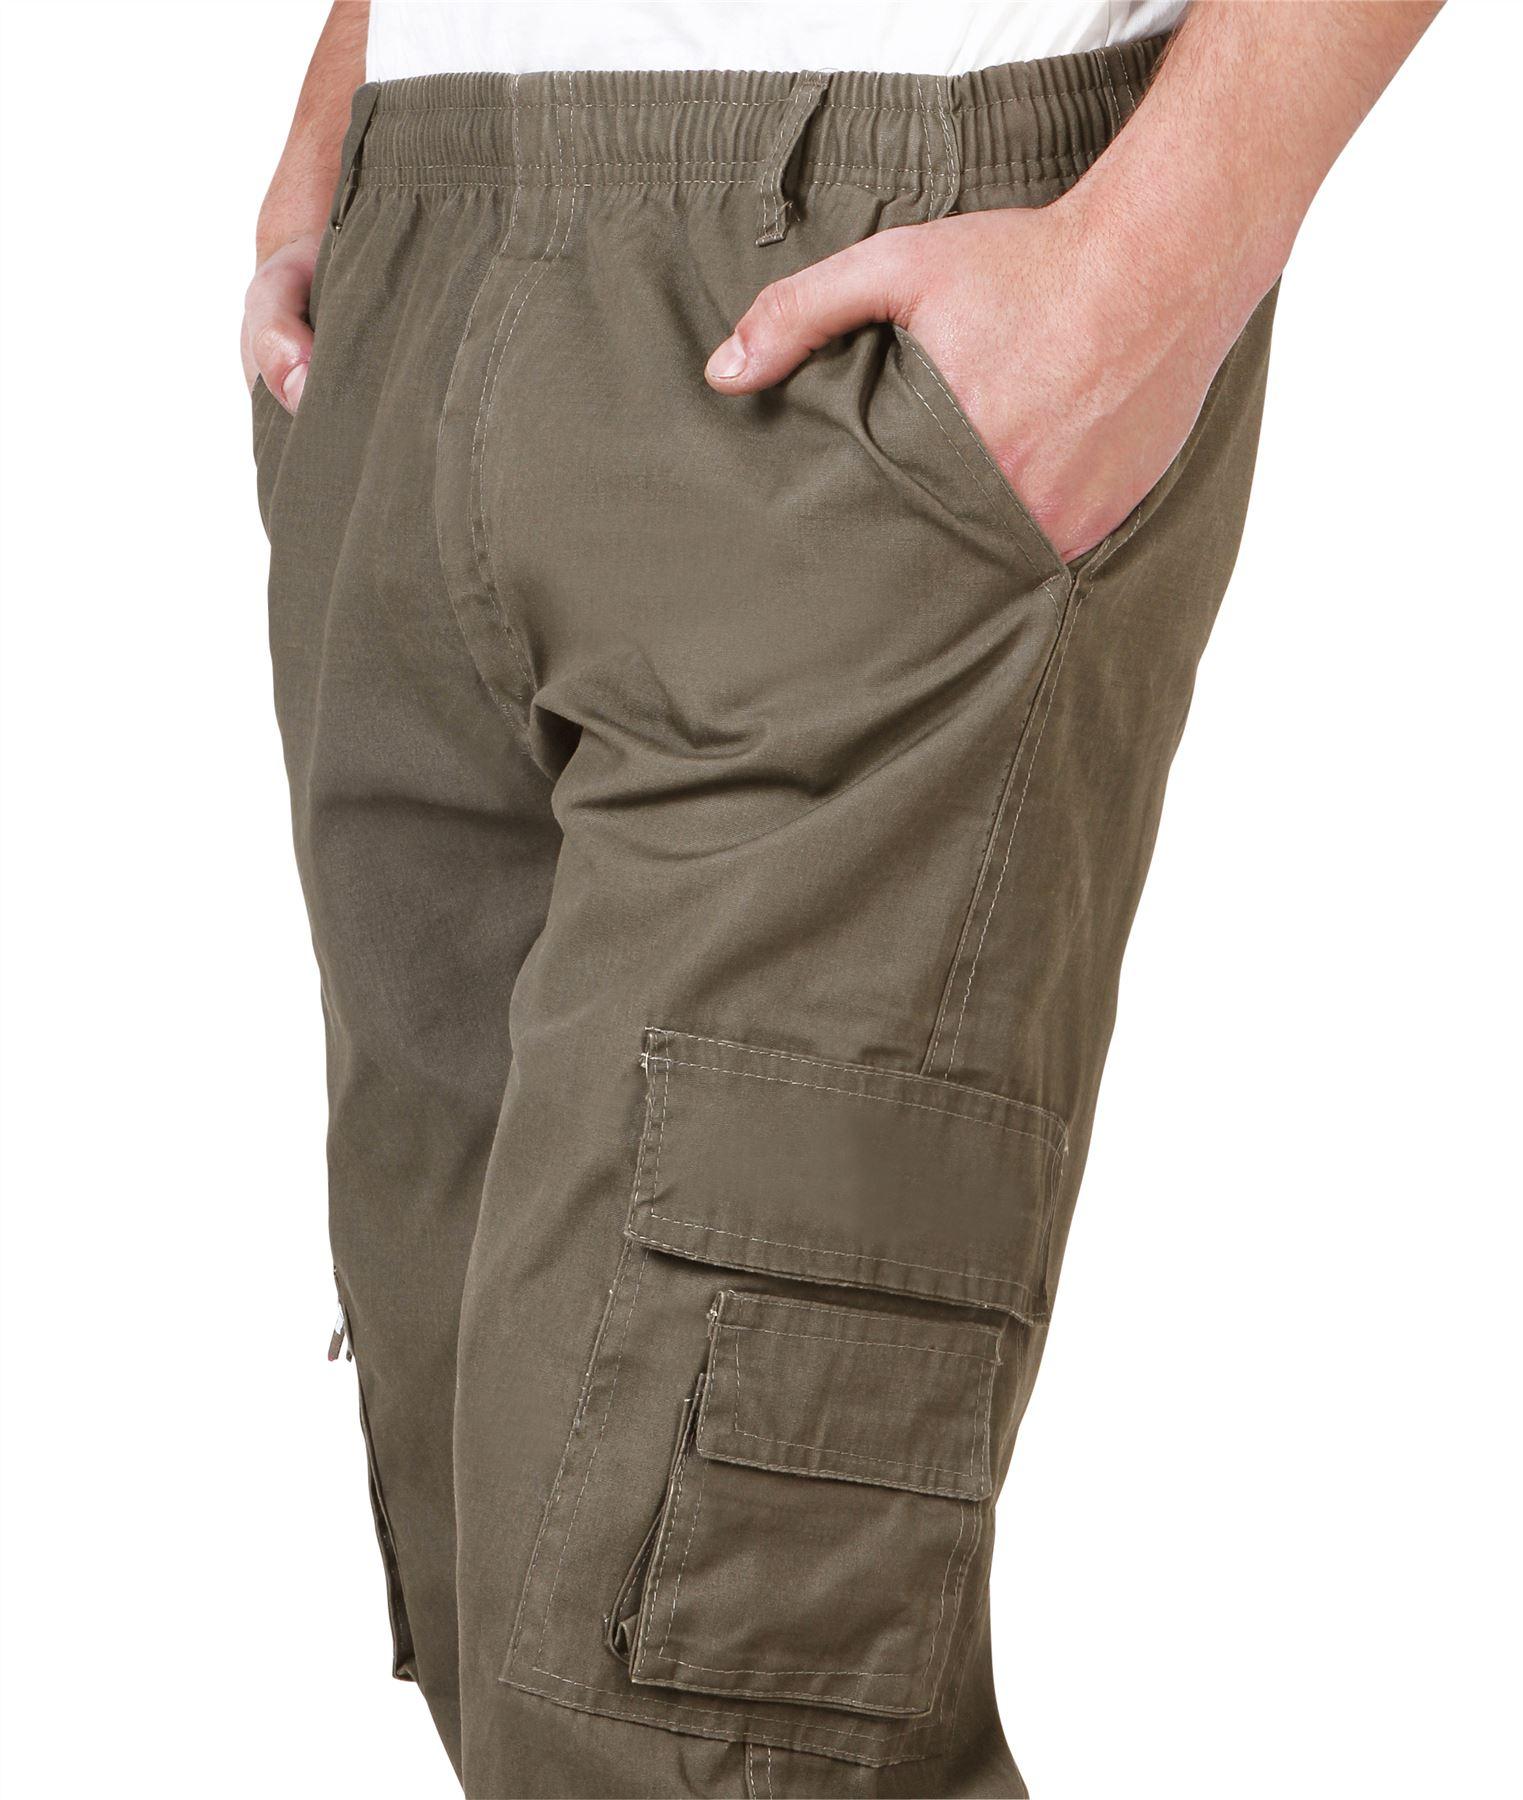 Pantalones-Hombre-Estilo-Cargo-Militar-Combate-Multibolsillos-Casual miniatura 33